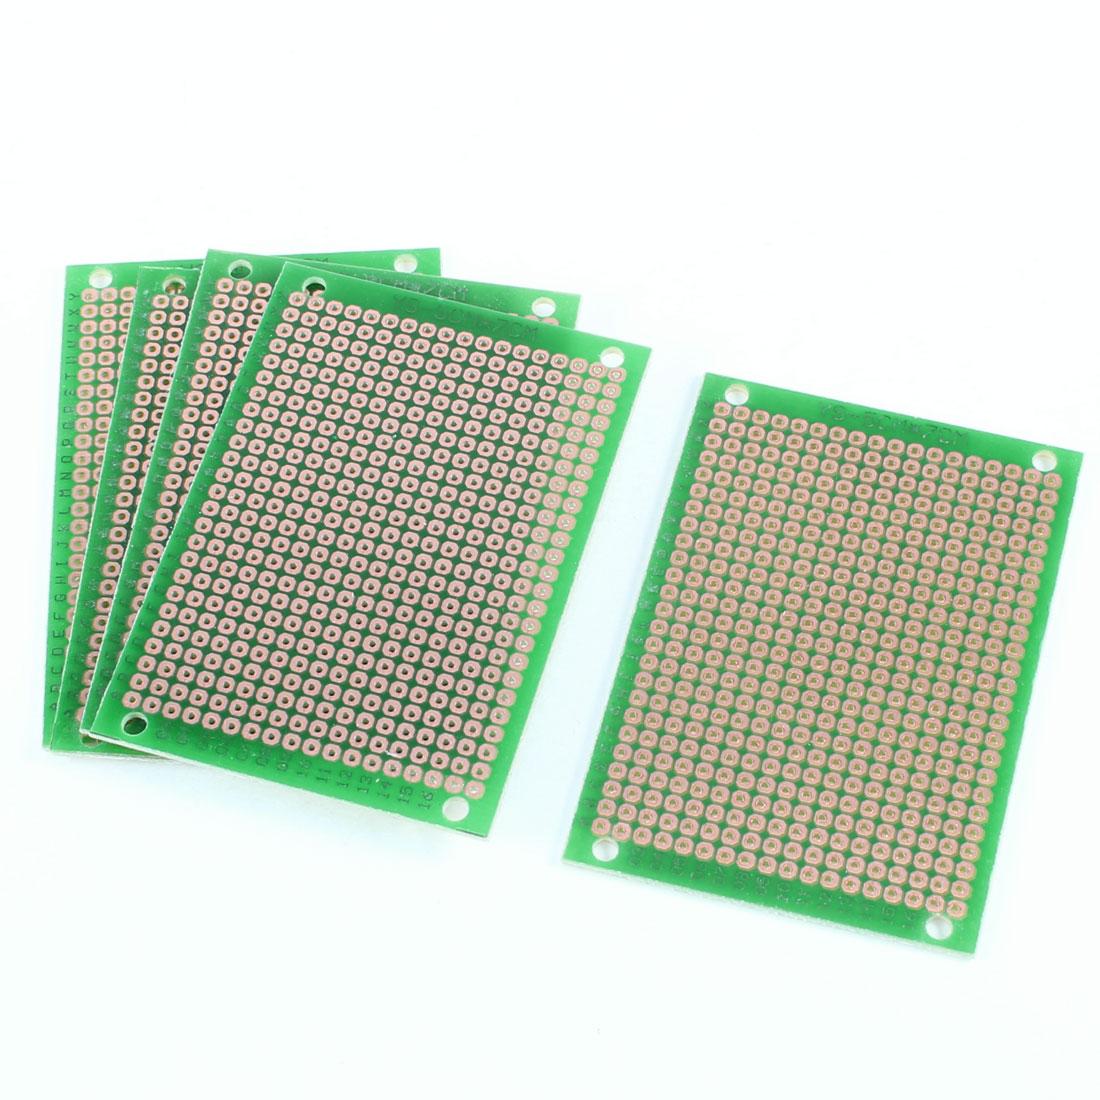 5 Pcs 5cm x 7cm Solderable Prototype Universal PCB Circuit Board